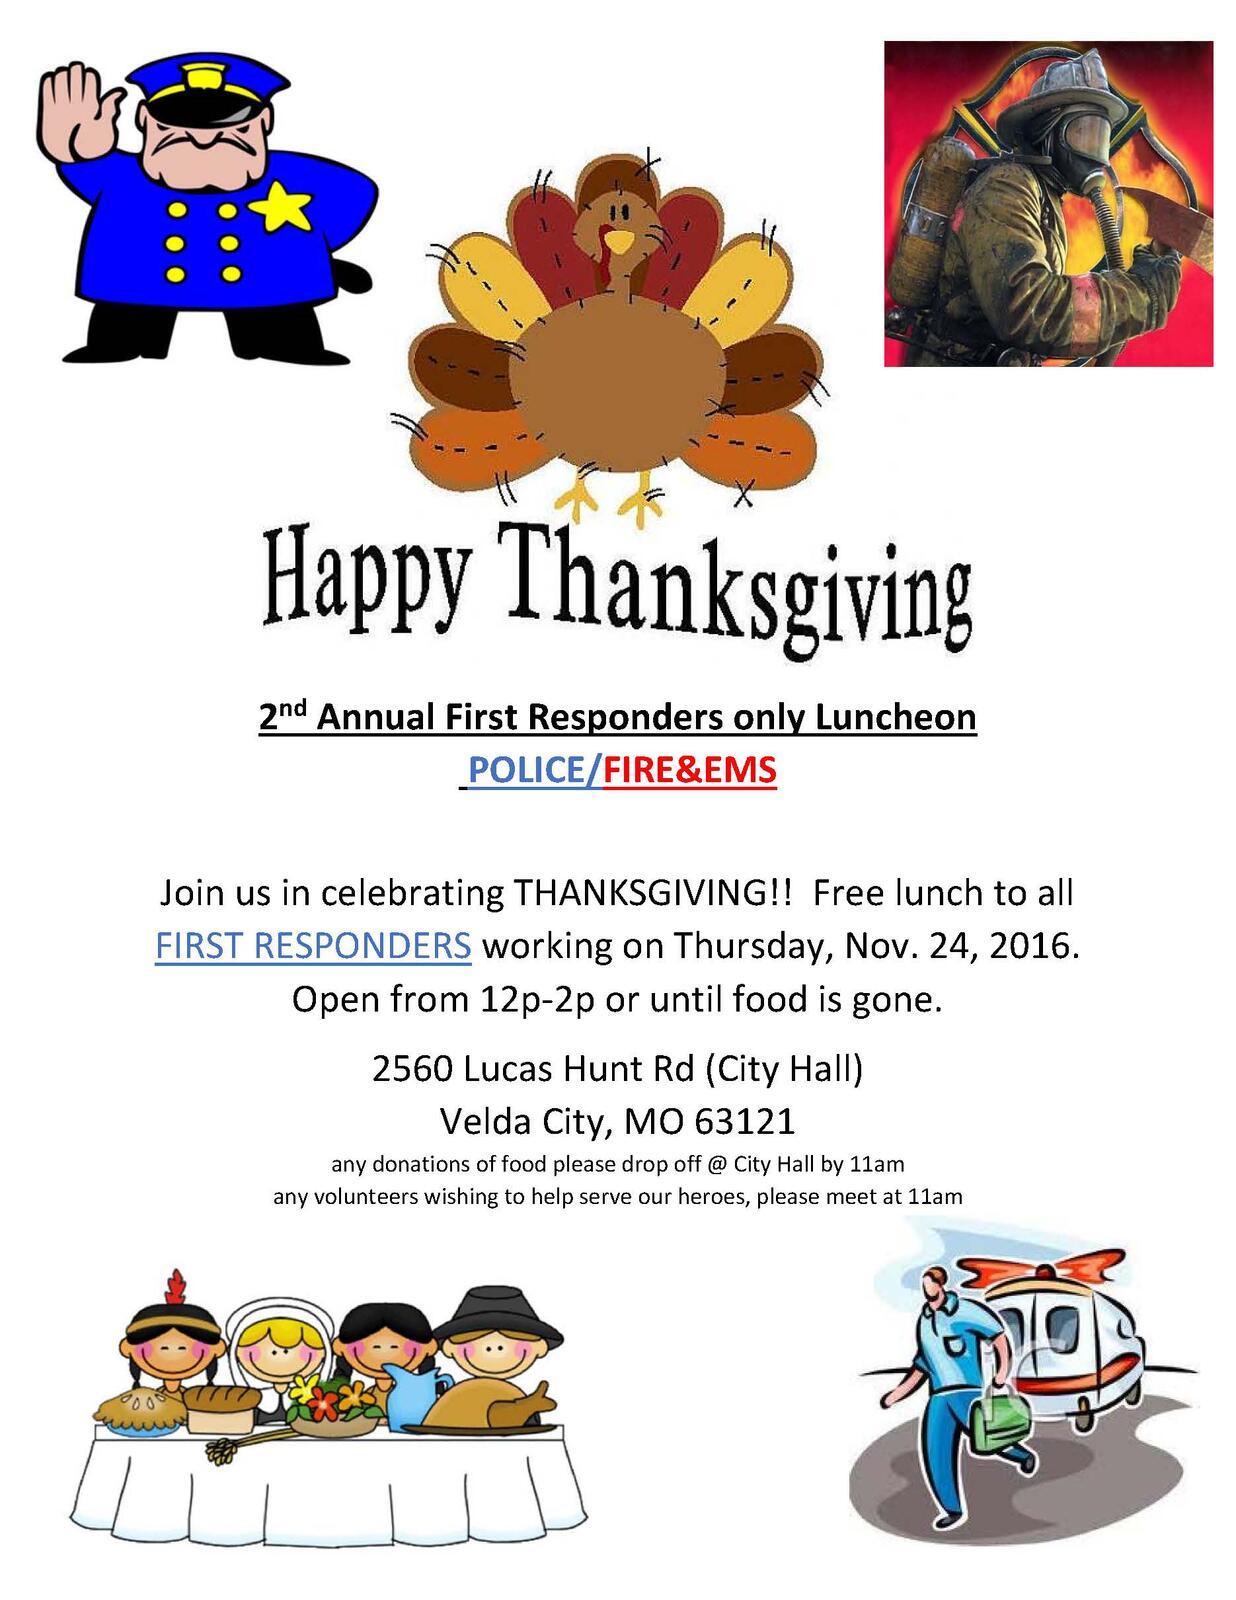 2nd Annual First Responders Only Thanksgiving Luncheon Velda City Police Department Mdash Nextdoor Nextdoor